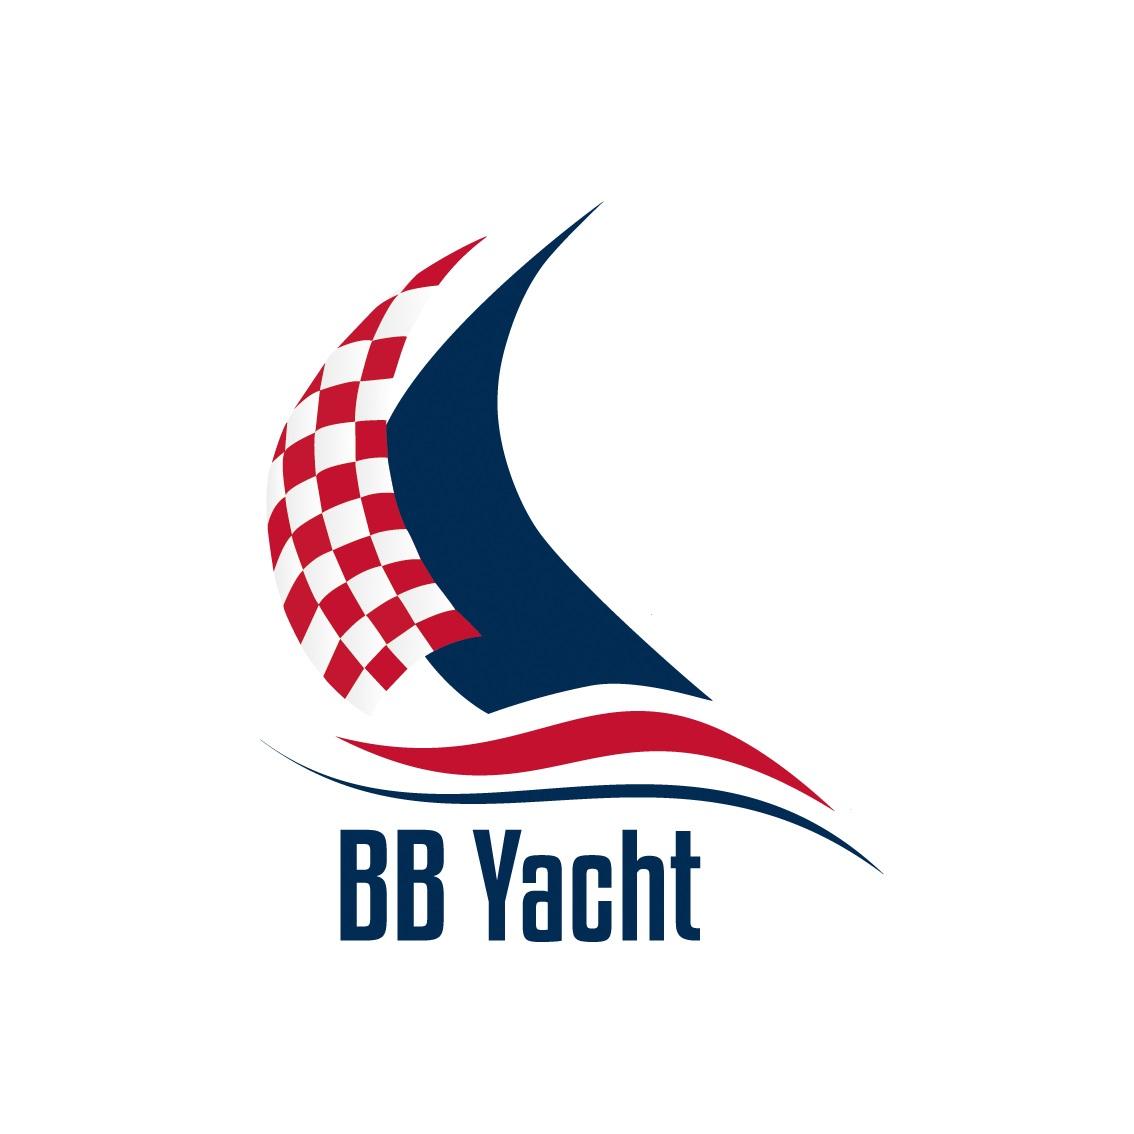 BB Yacht